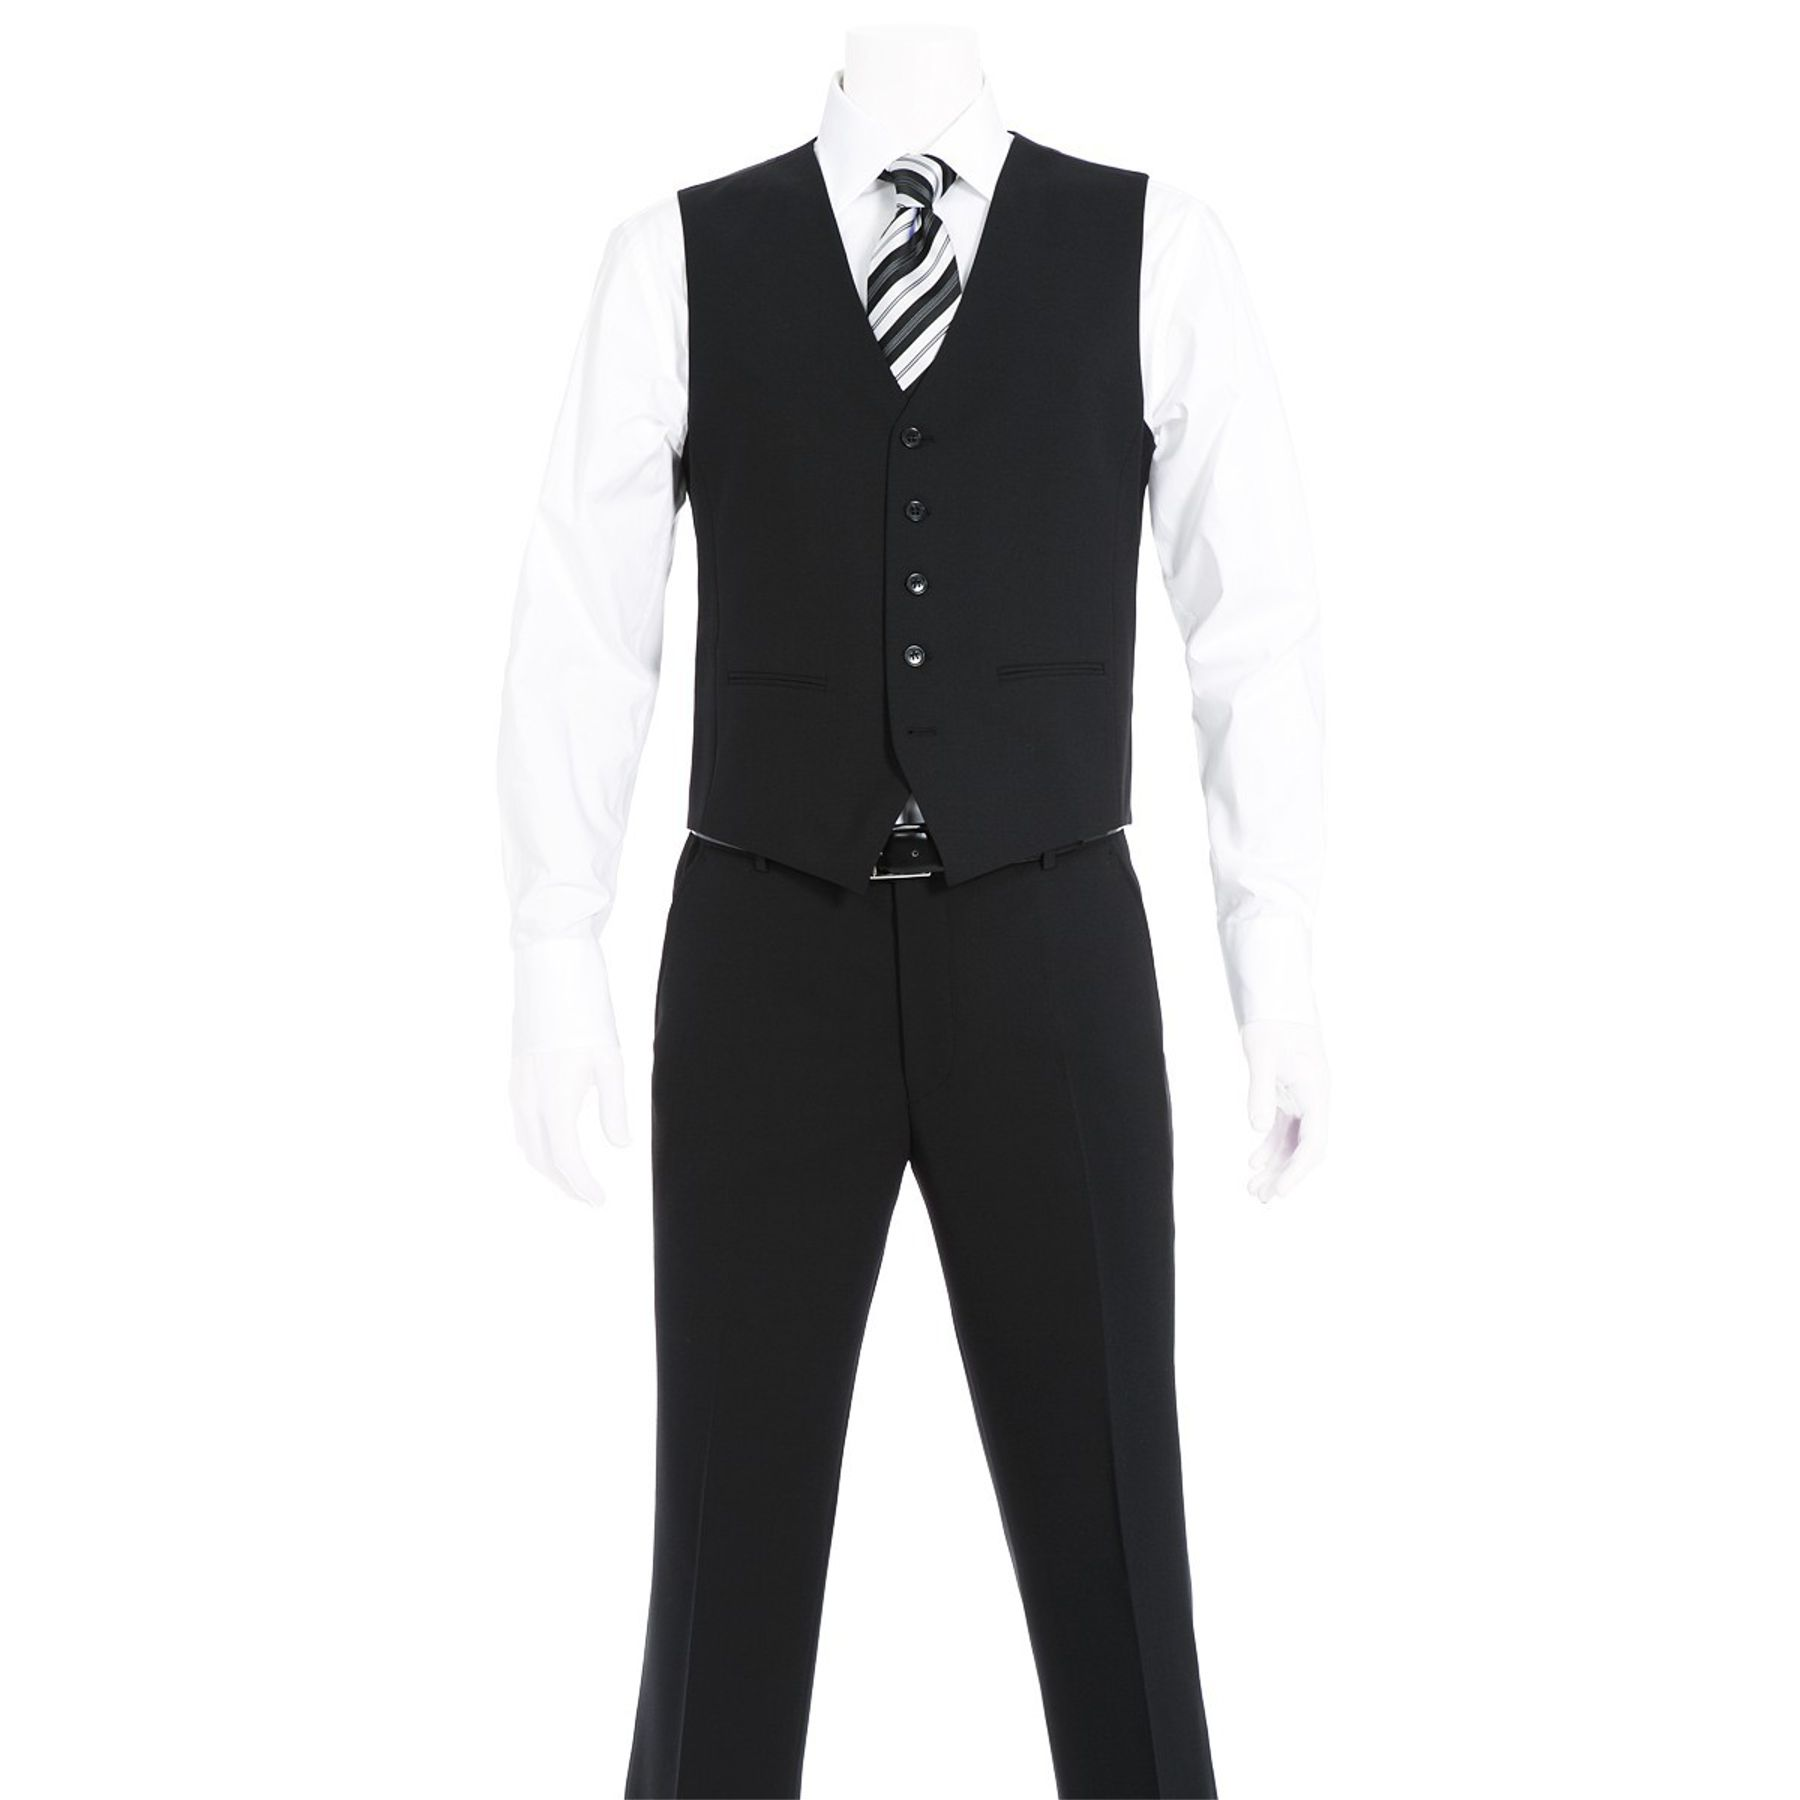 Benvenuto Black - Regular Fit - Herren Baukasten Weste (Artikel: 20097, Modell: 60211) – Bild 3